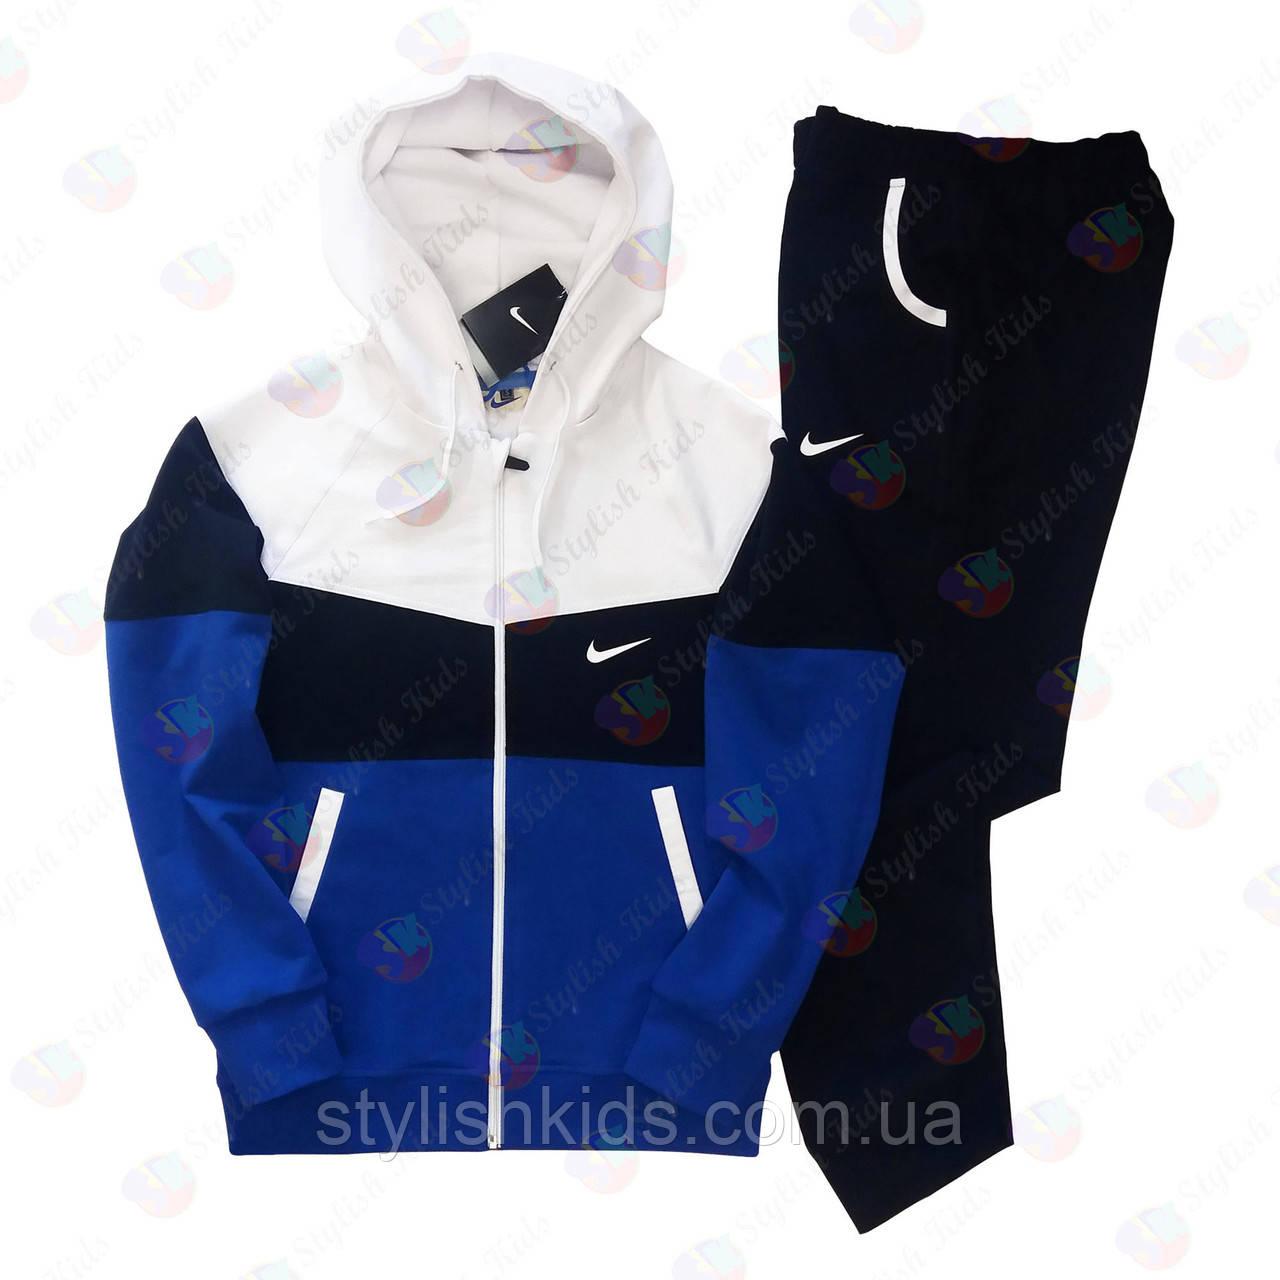 bcbf8f7e909bb3 Купить спортивный костюм на мальчика Найк в Украине пром.юа.Костюм  спортивный на мальчика